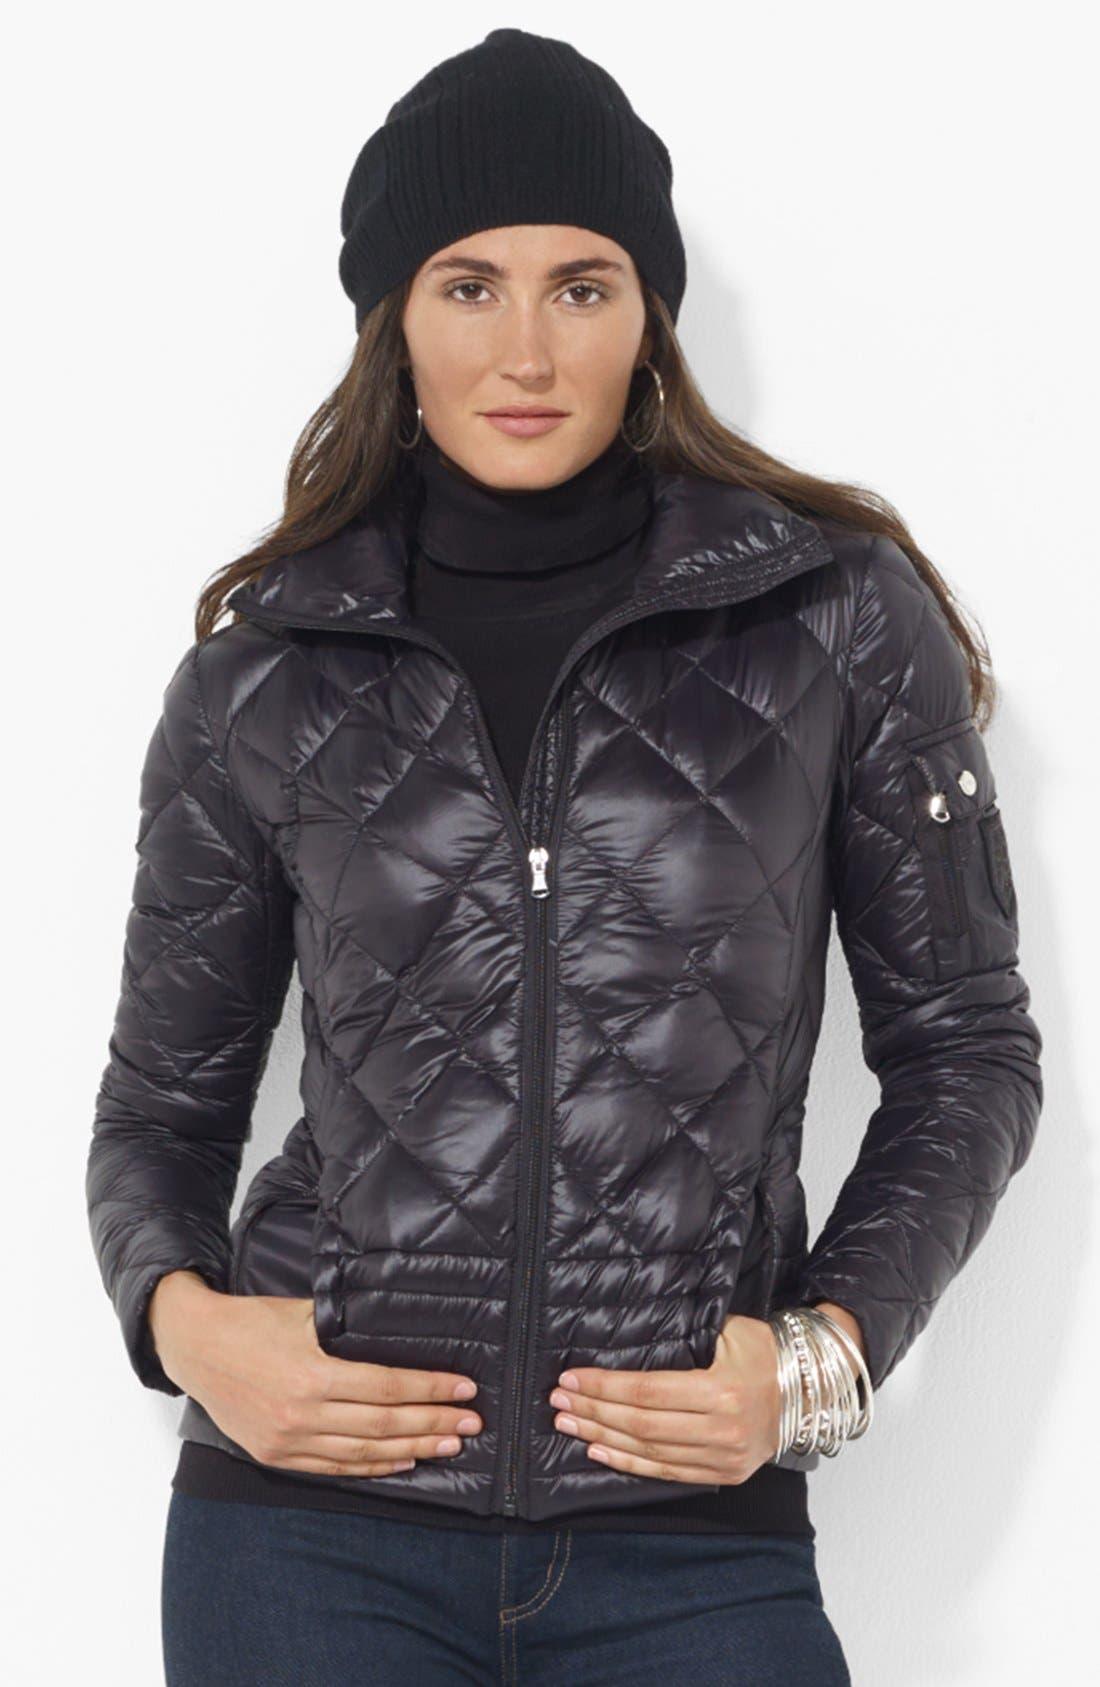 Mixed Quilt Packable Down Jacket,                             Main thumbnail 1, color,                             Black